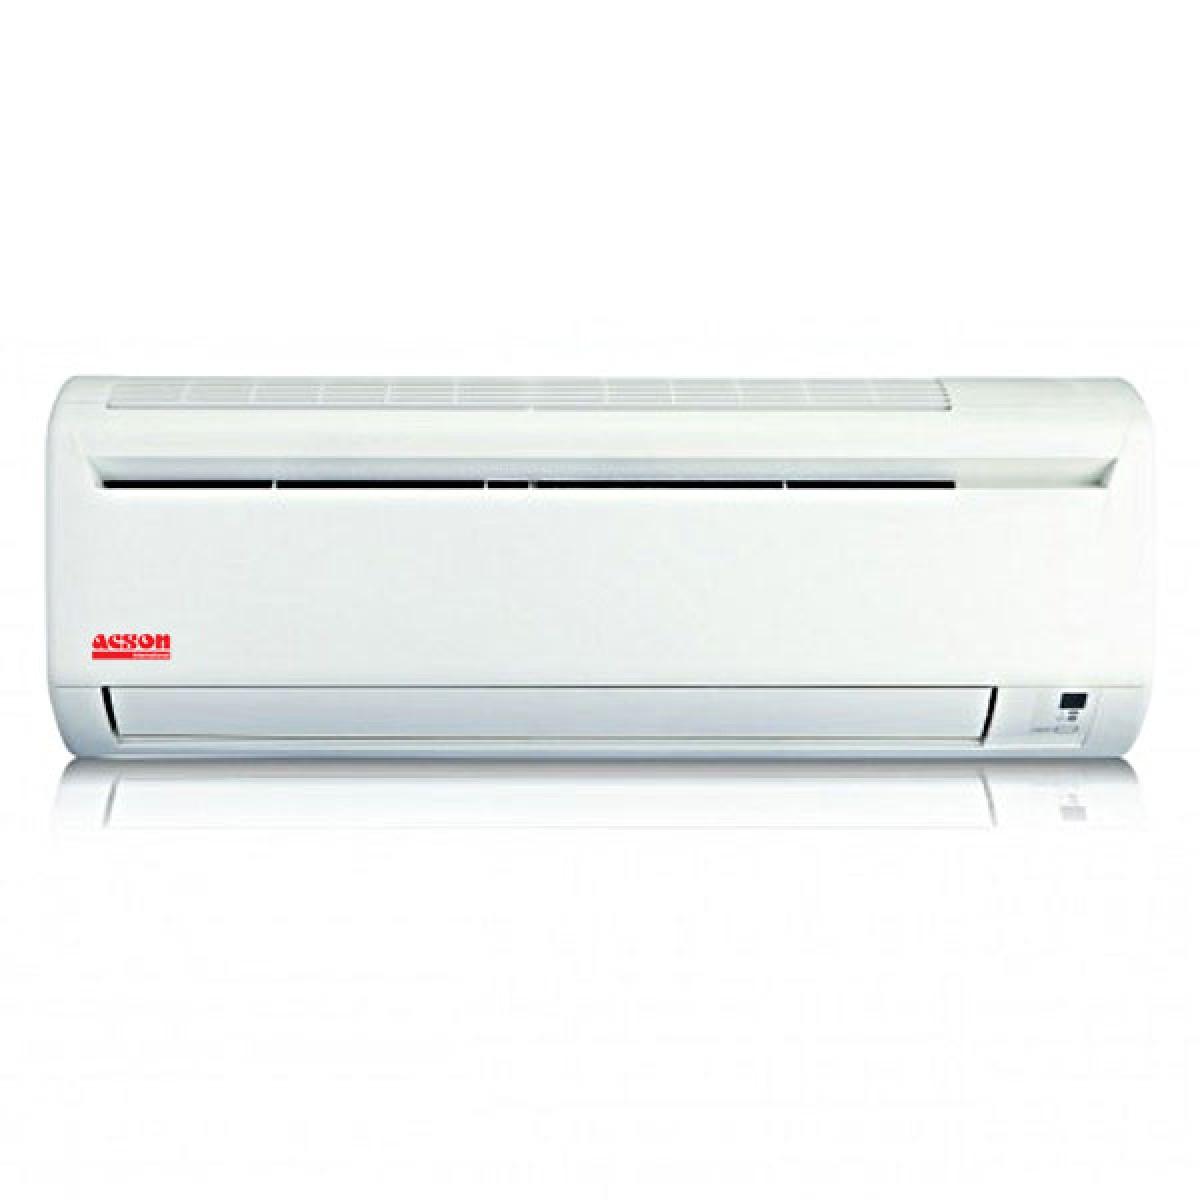 Acson Air Conditioner 1 5 Ton Price In Pakistan Buy